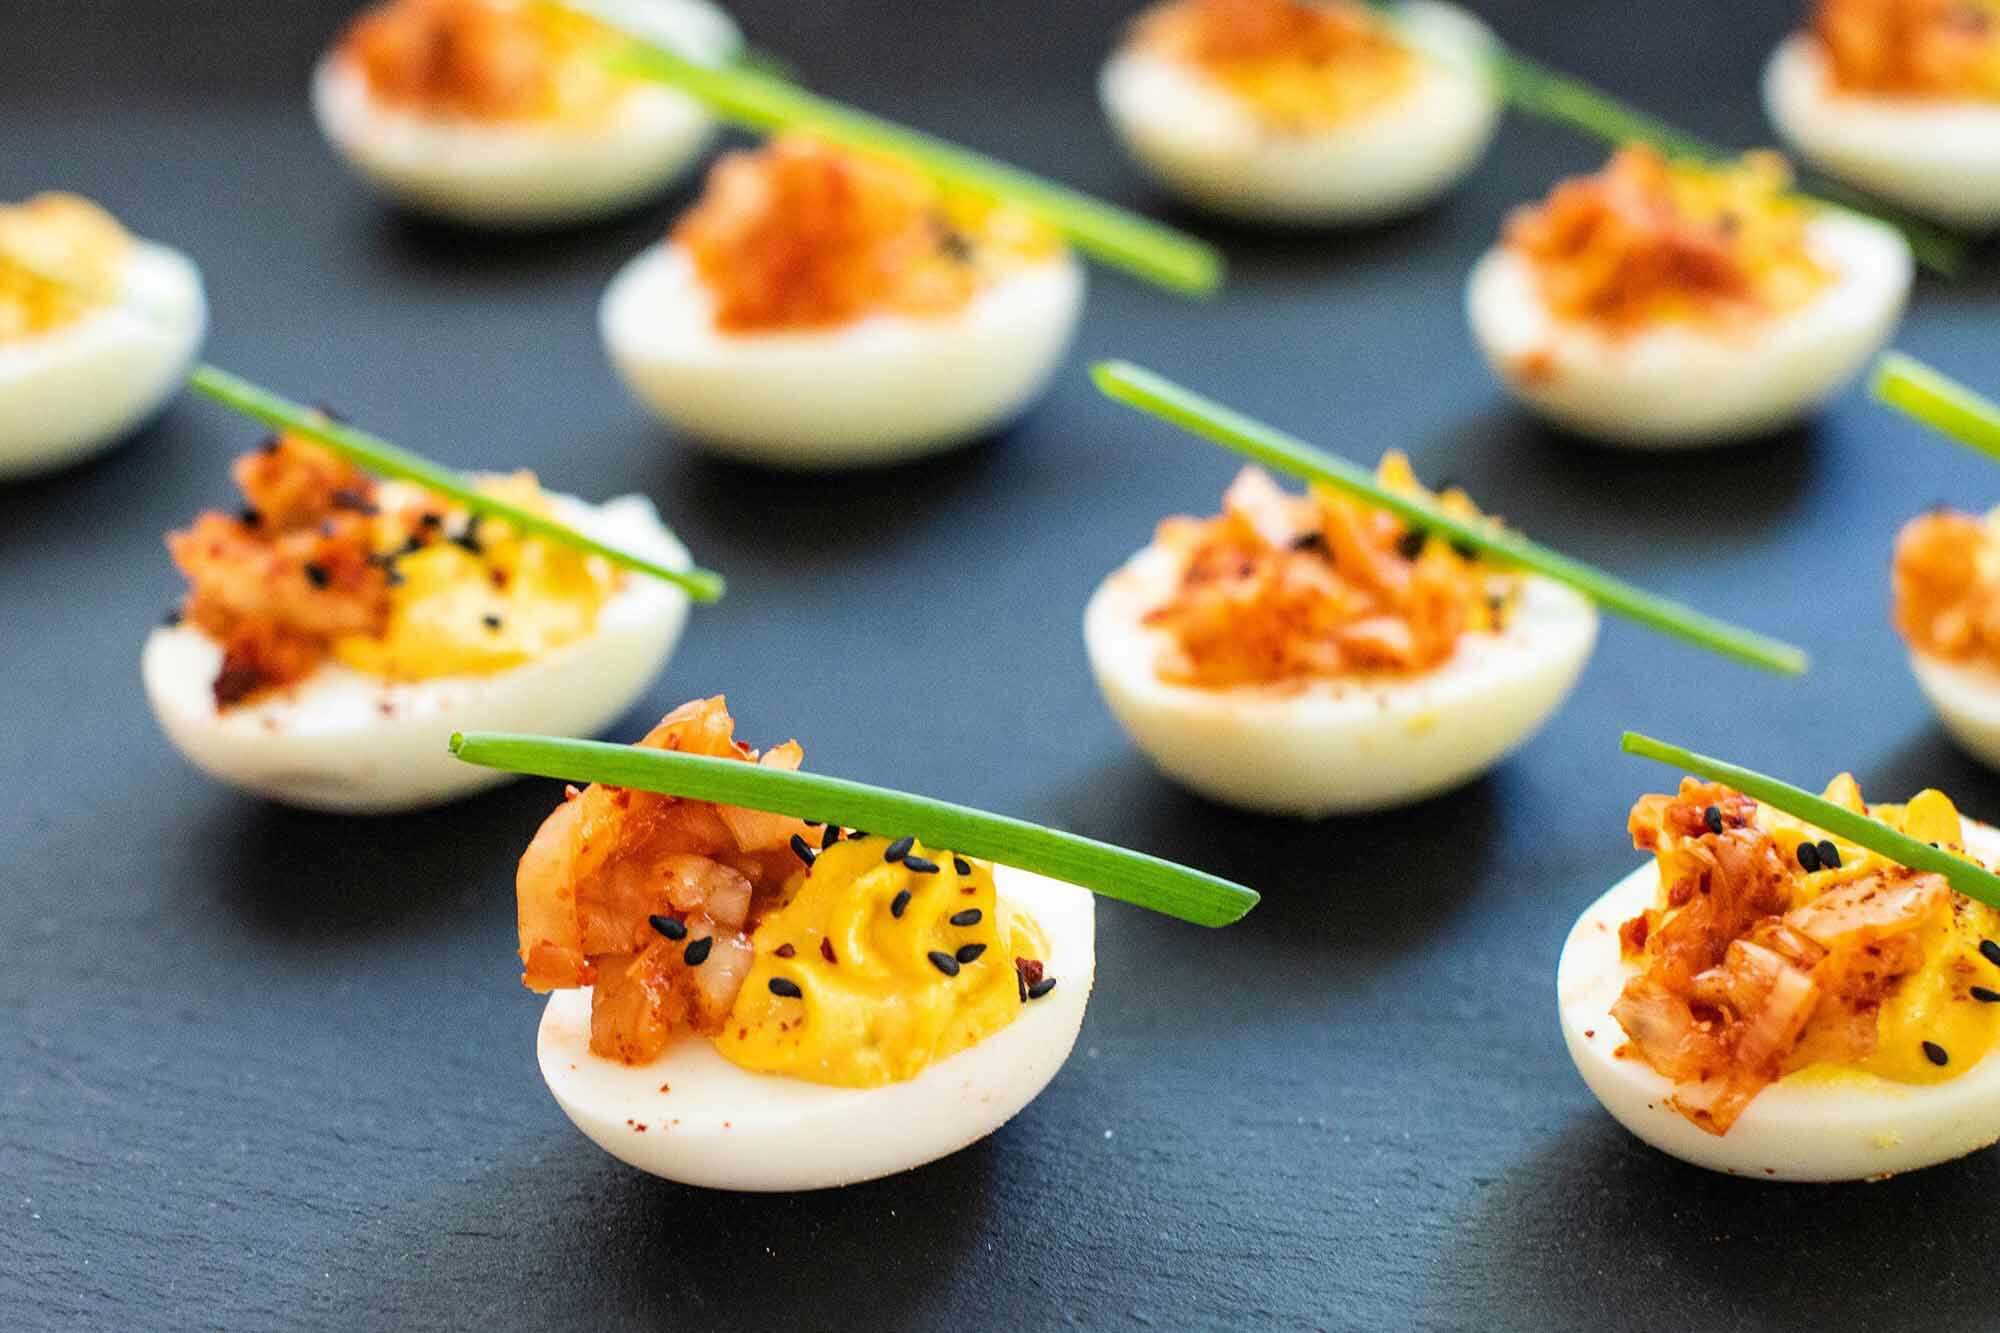 Deviled Egg Recipe with Kimchi serve the deviled eggs